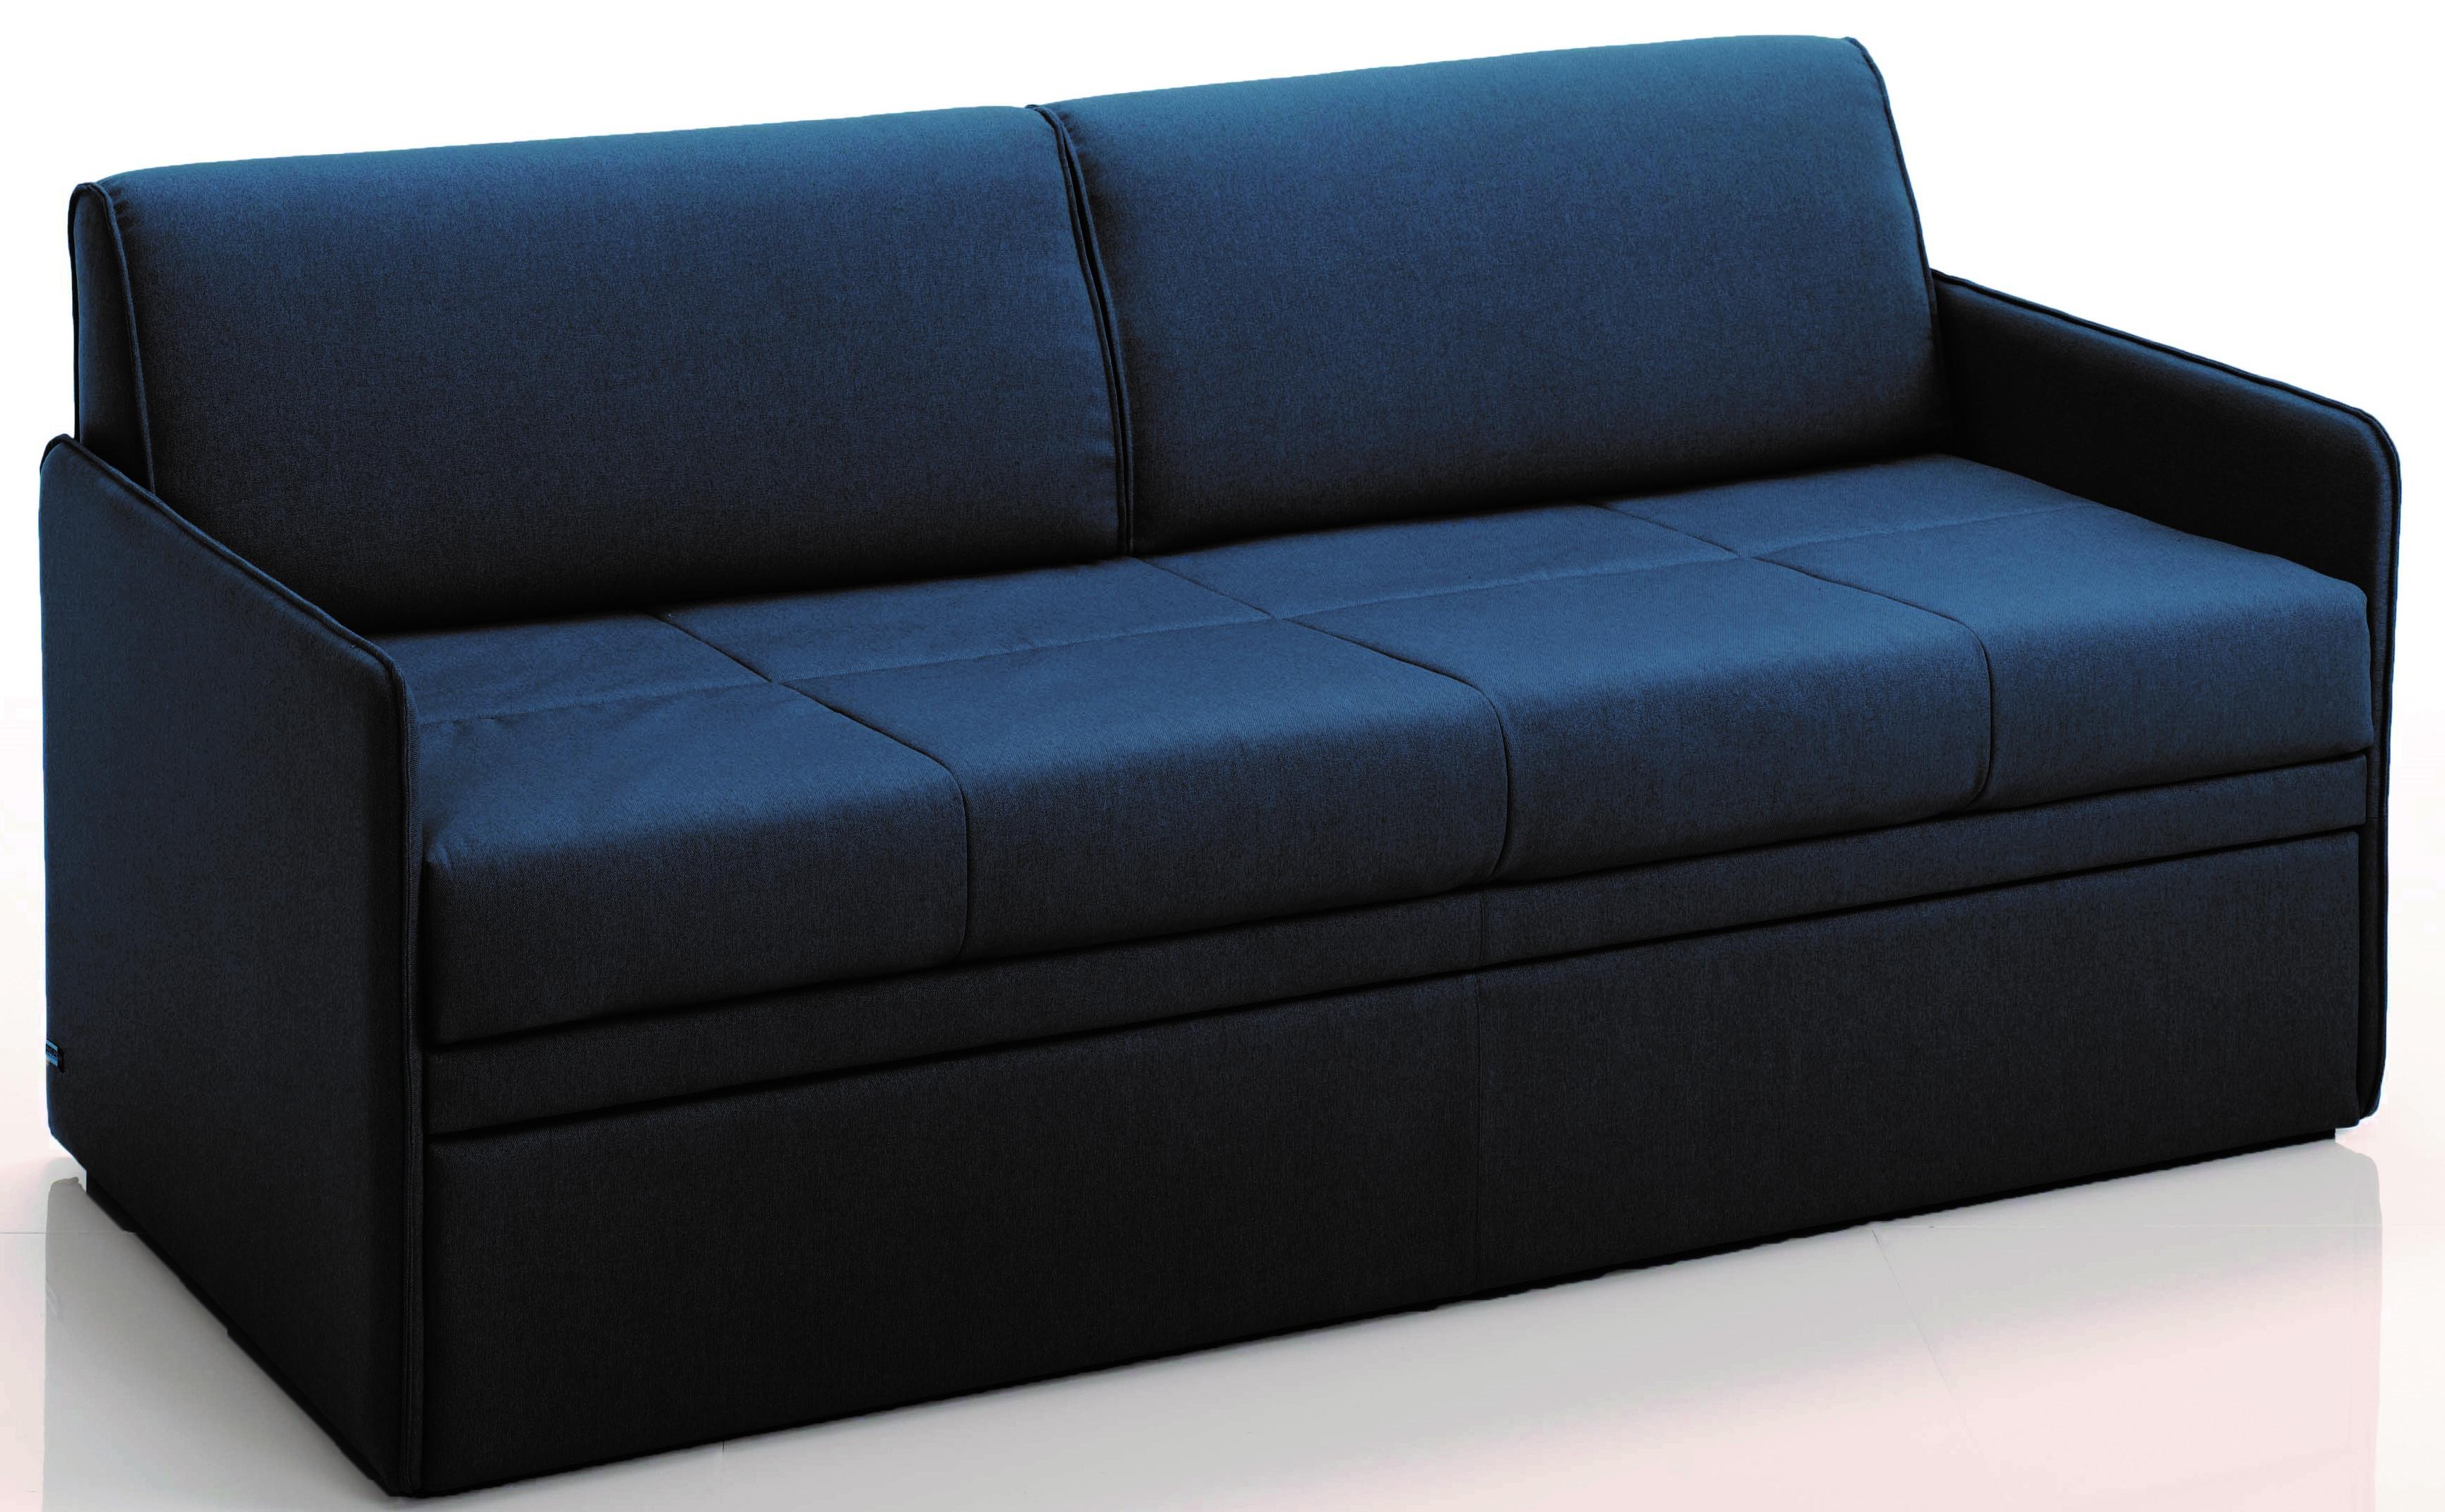 canap convertible gigogne 3 places microfibre anthracite cassis. Black Bedroom Furniture Sets. Home Design Ideas